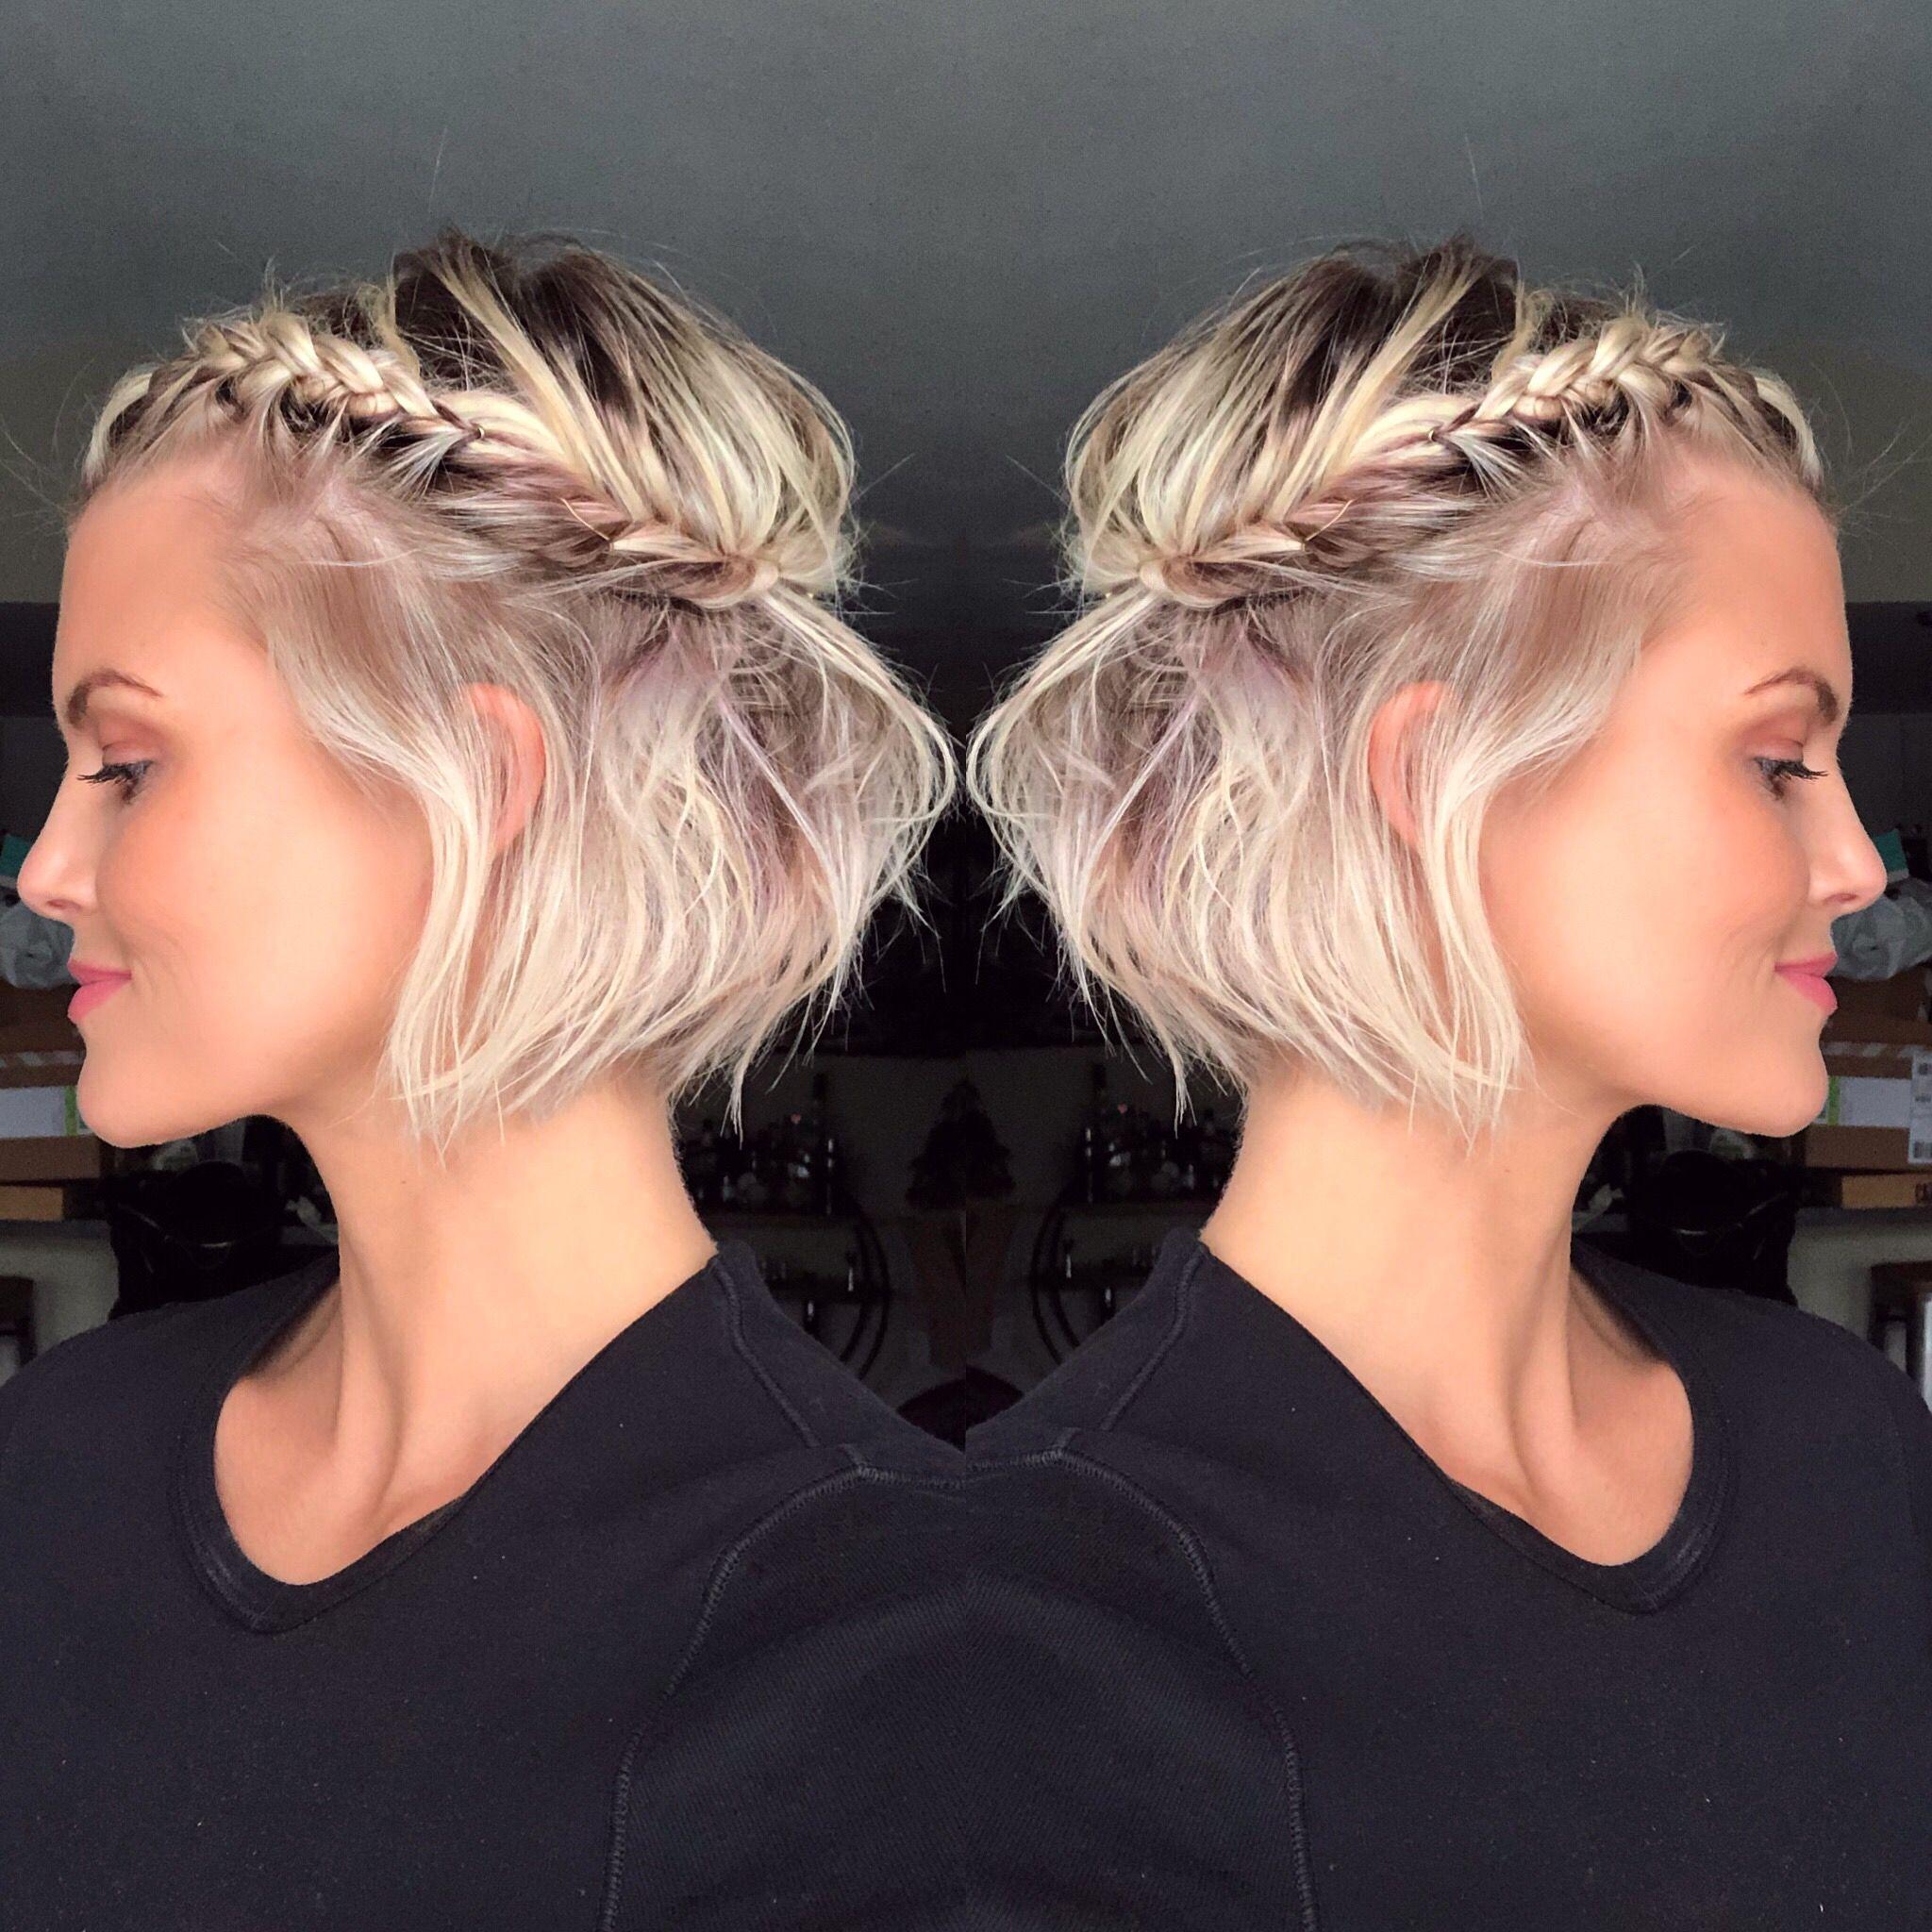 Krissafowles Short Blonde Hair Braids For Short Hair Short Blonde Hair Short Festival Hair